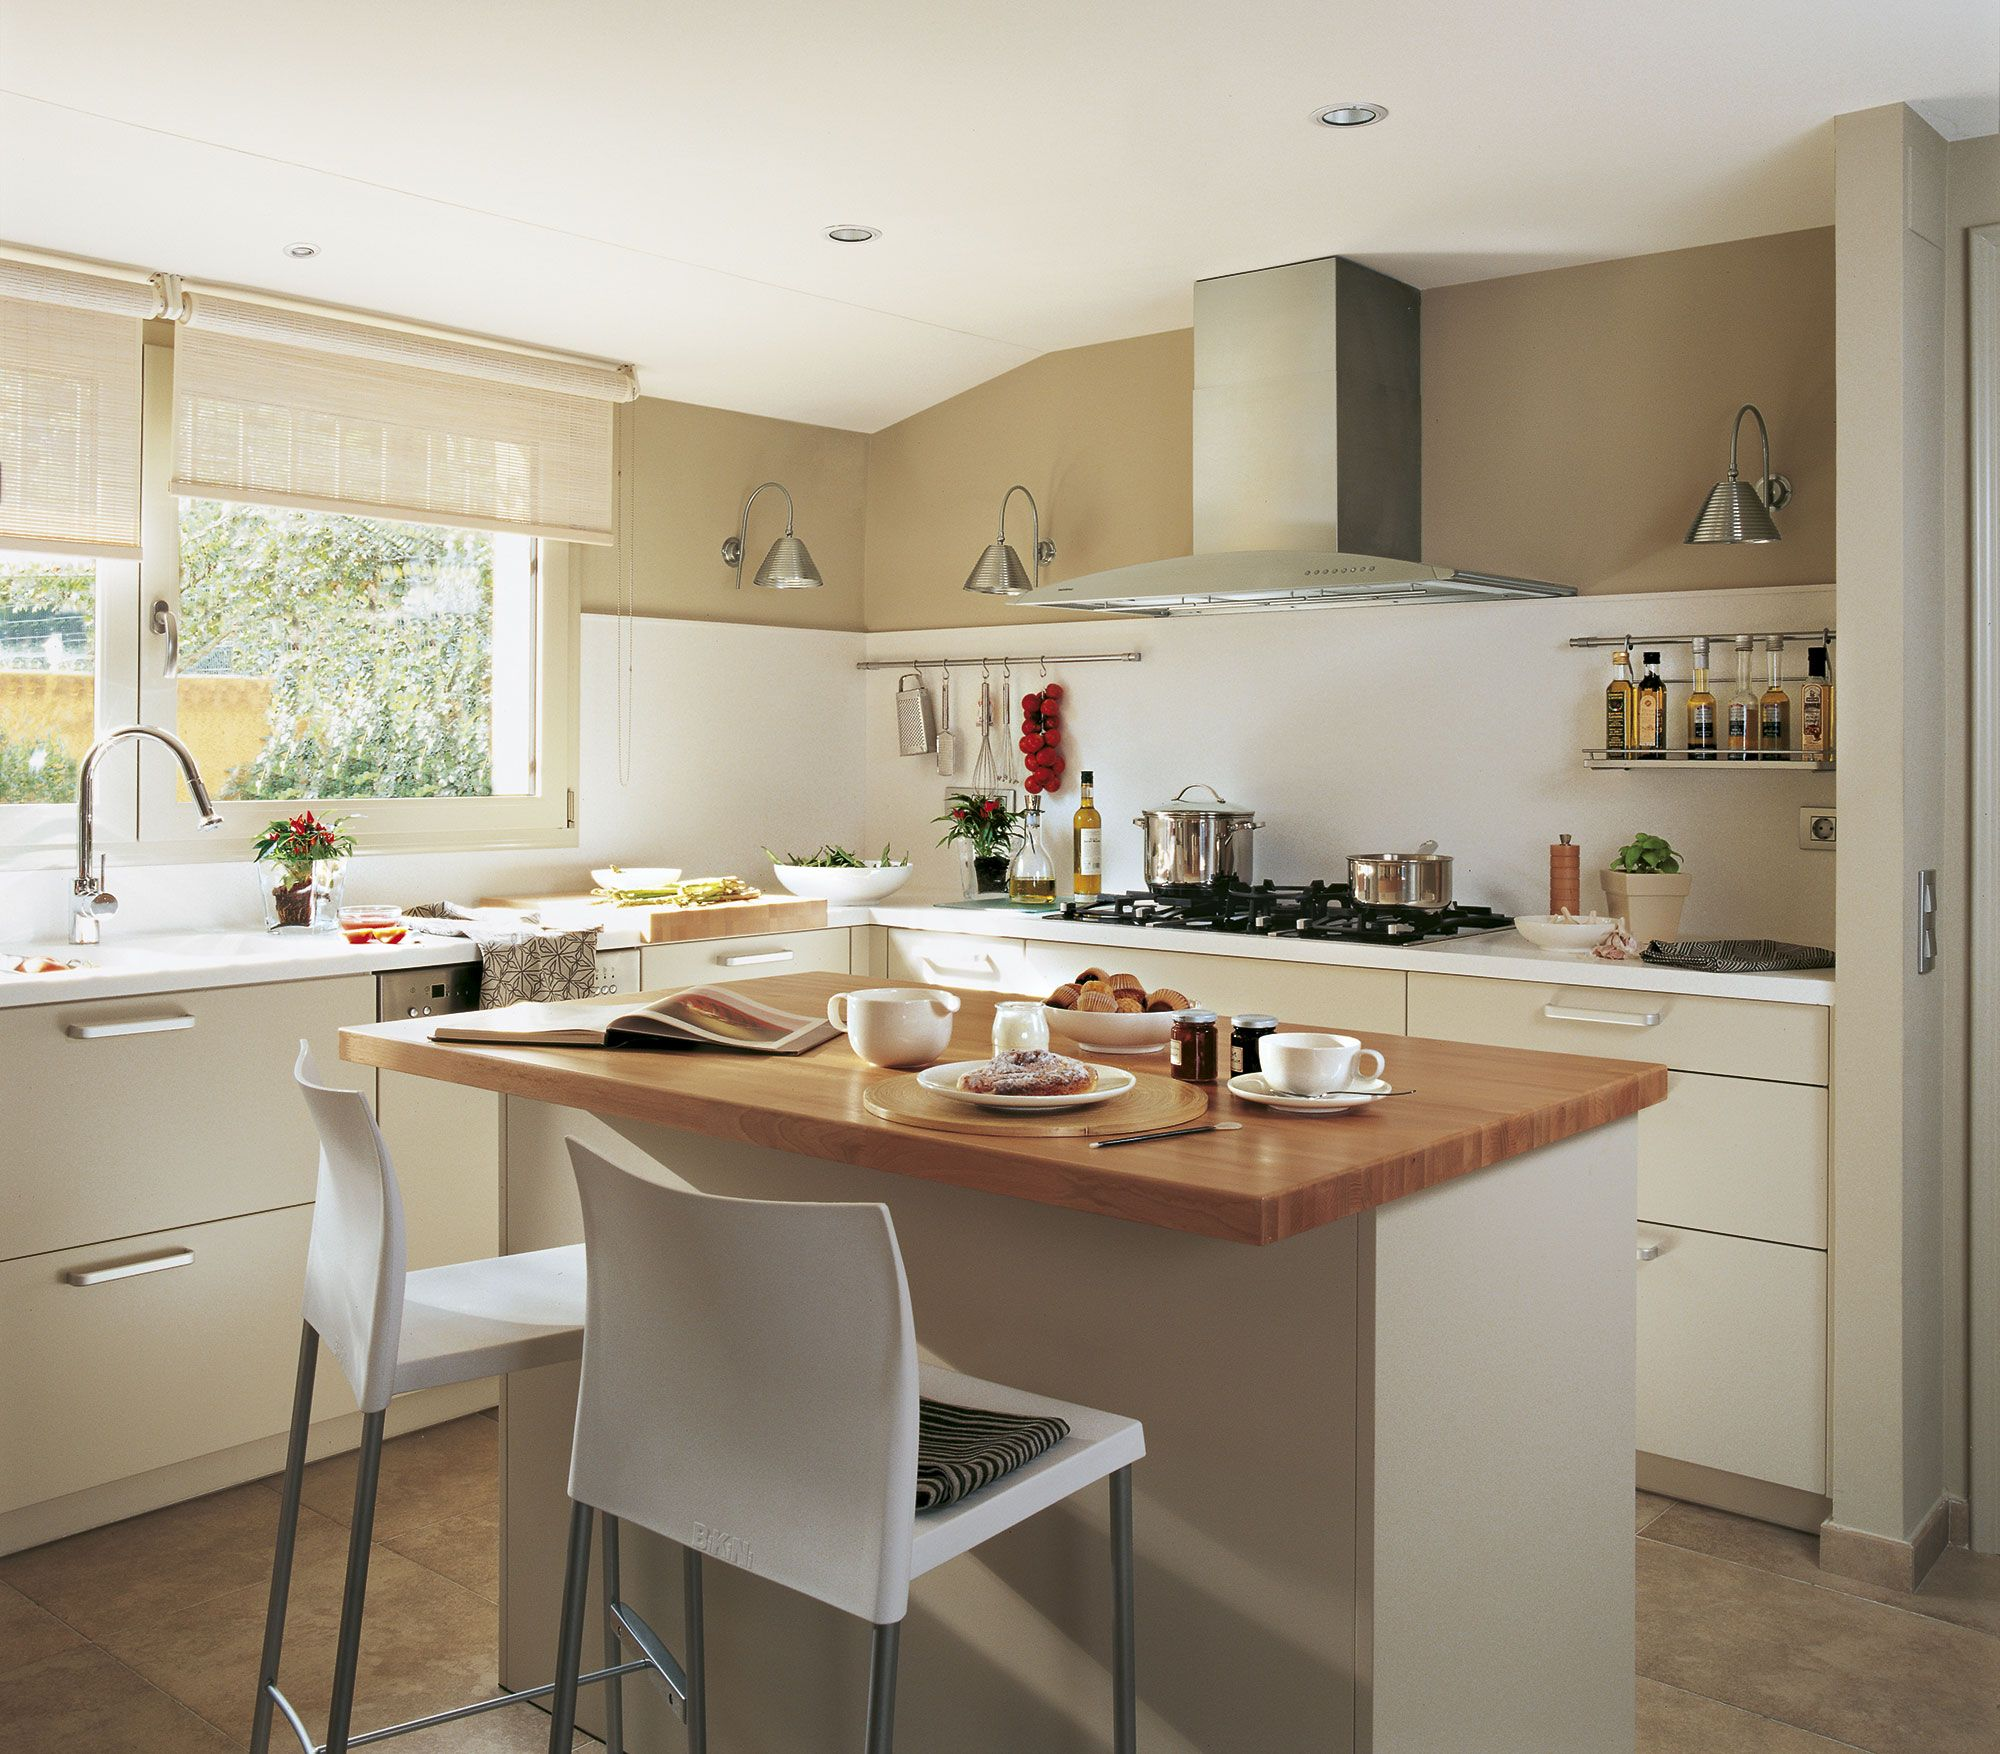 Desayuno comida o cena en la cocina mini espacios for Barra cocina madera